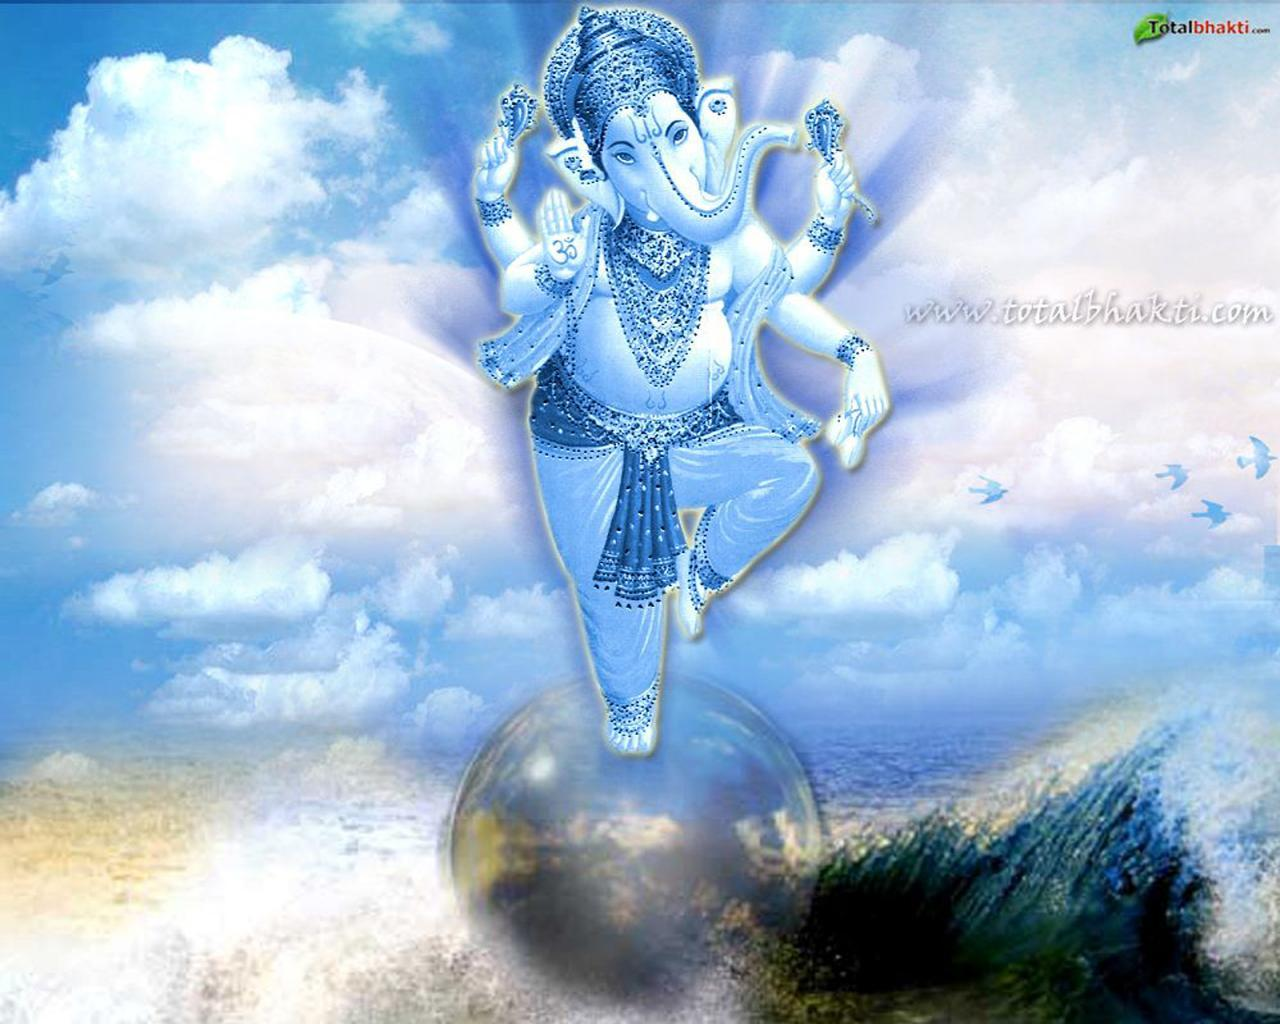 Free Ganesh Wallpaper | Free Wallpapers | Pinterest | Ganesh ...